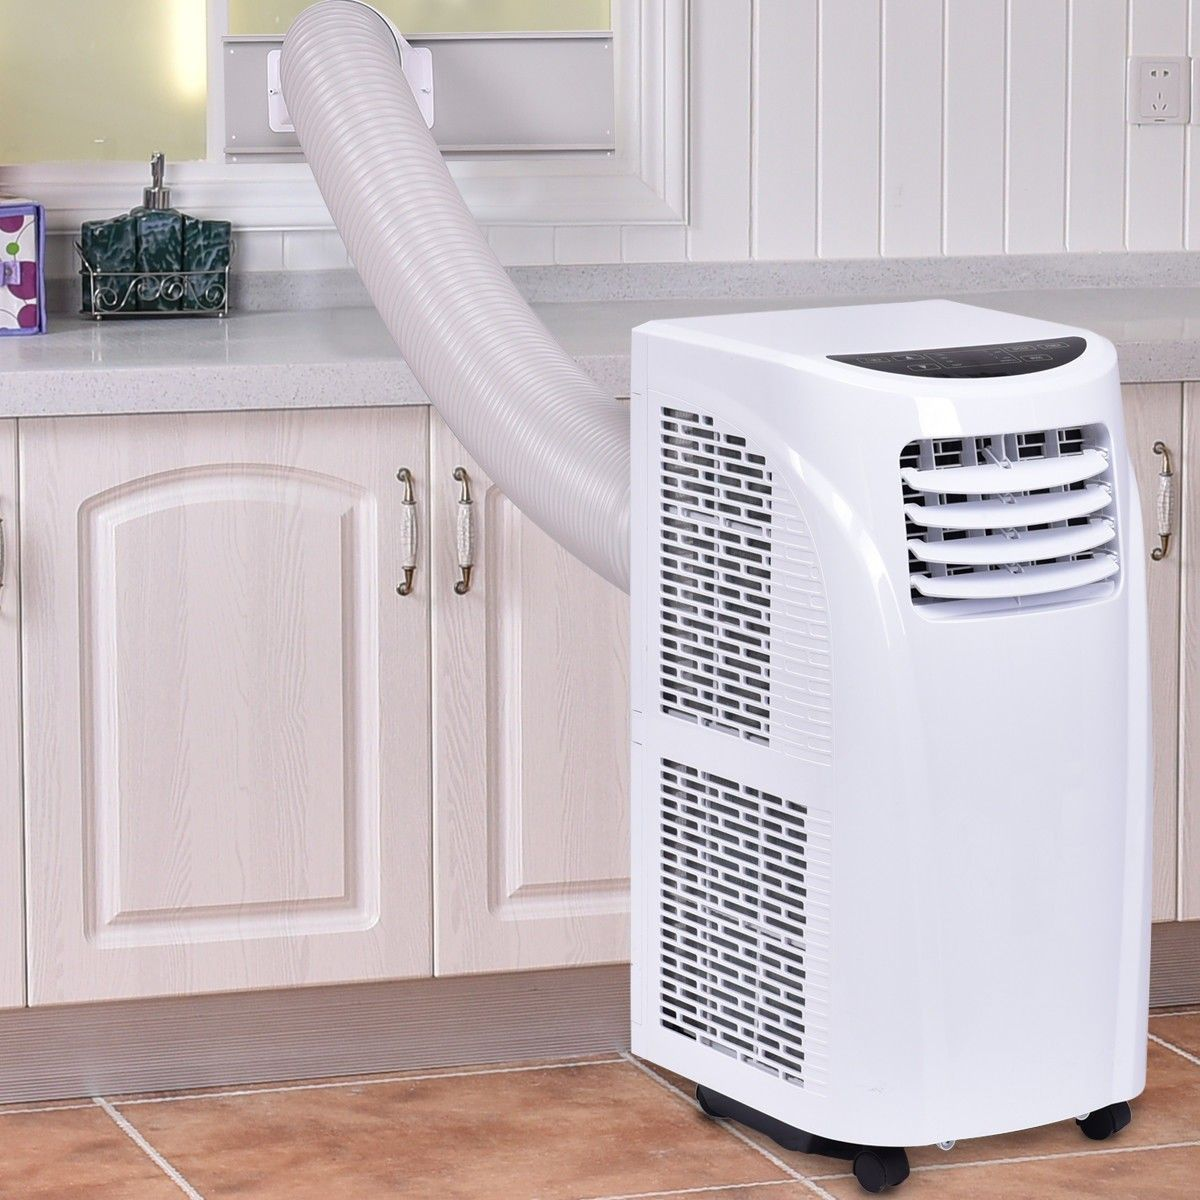 10000 BTU Portable Air Conditioner & Dehumidifier with